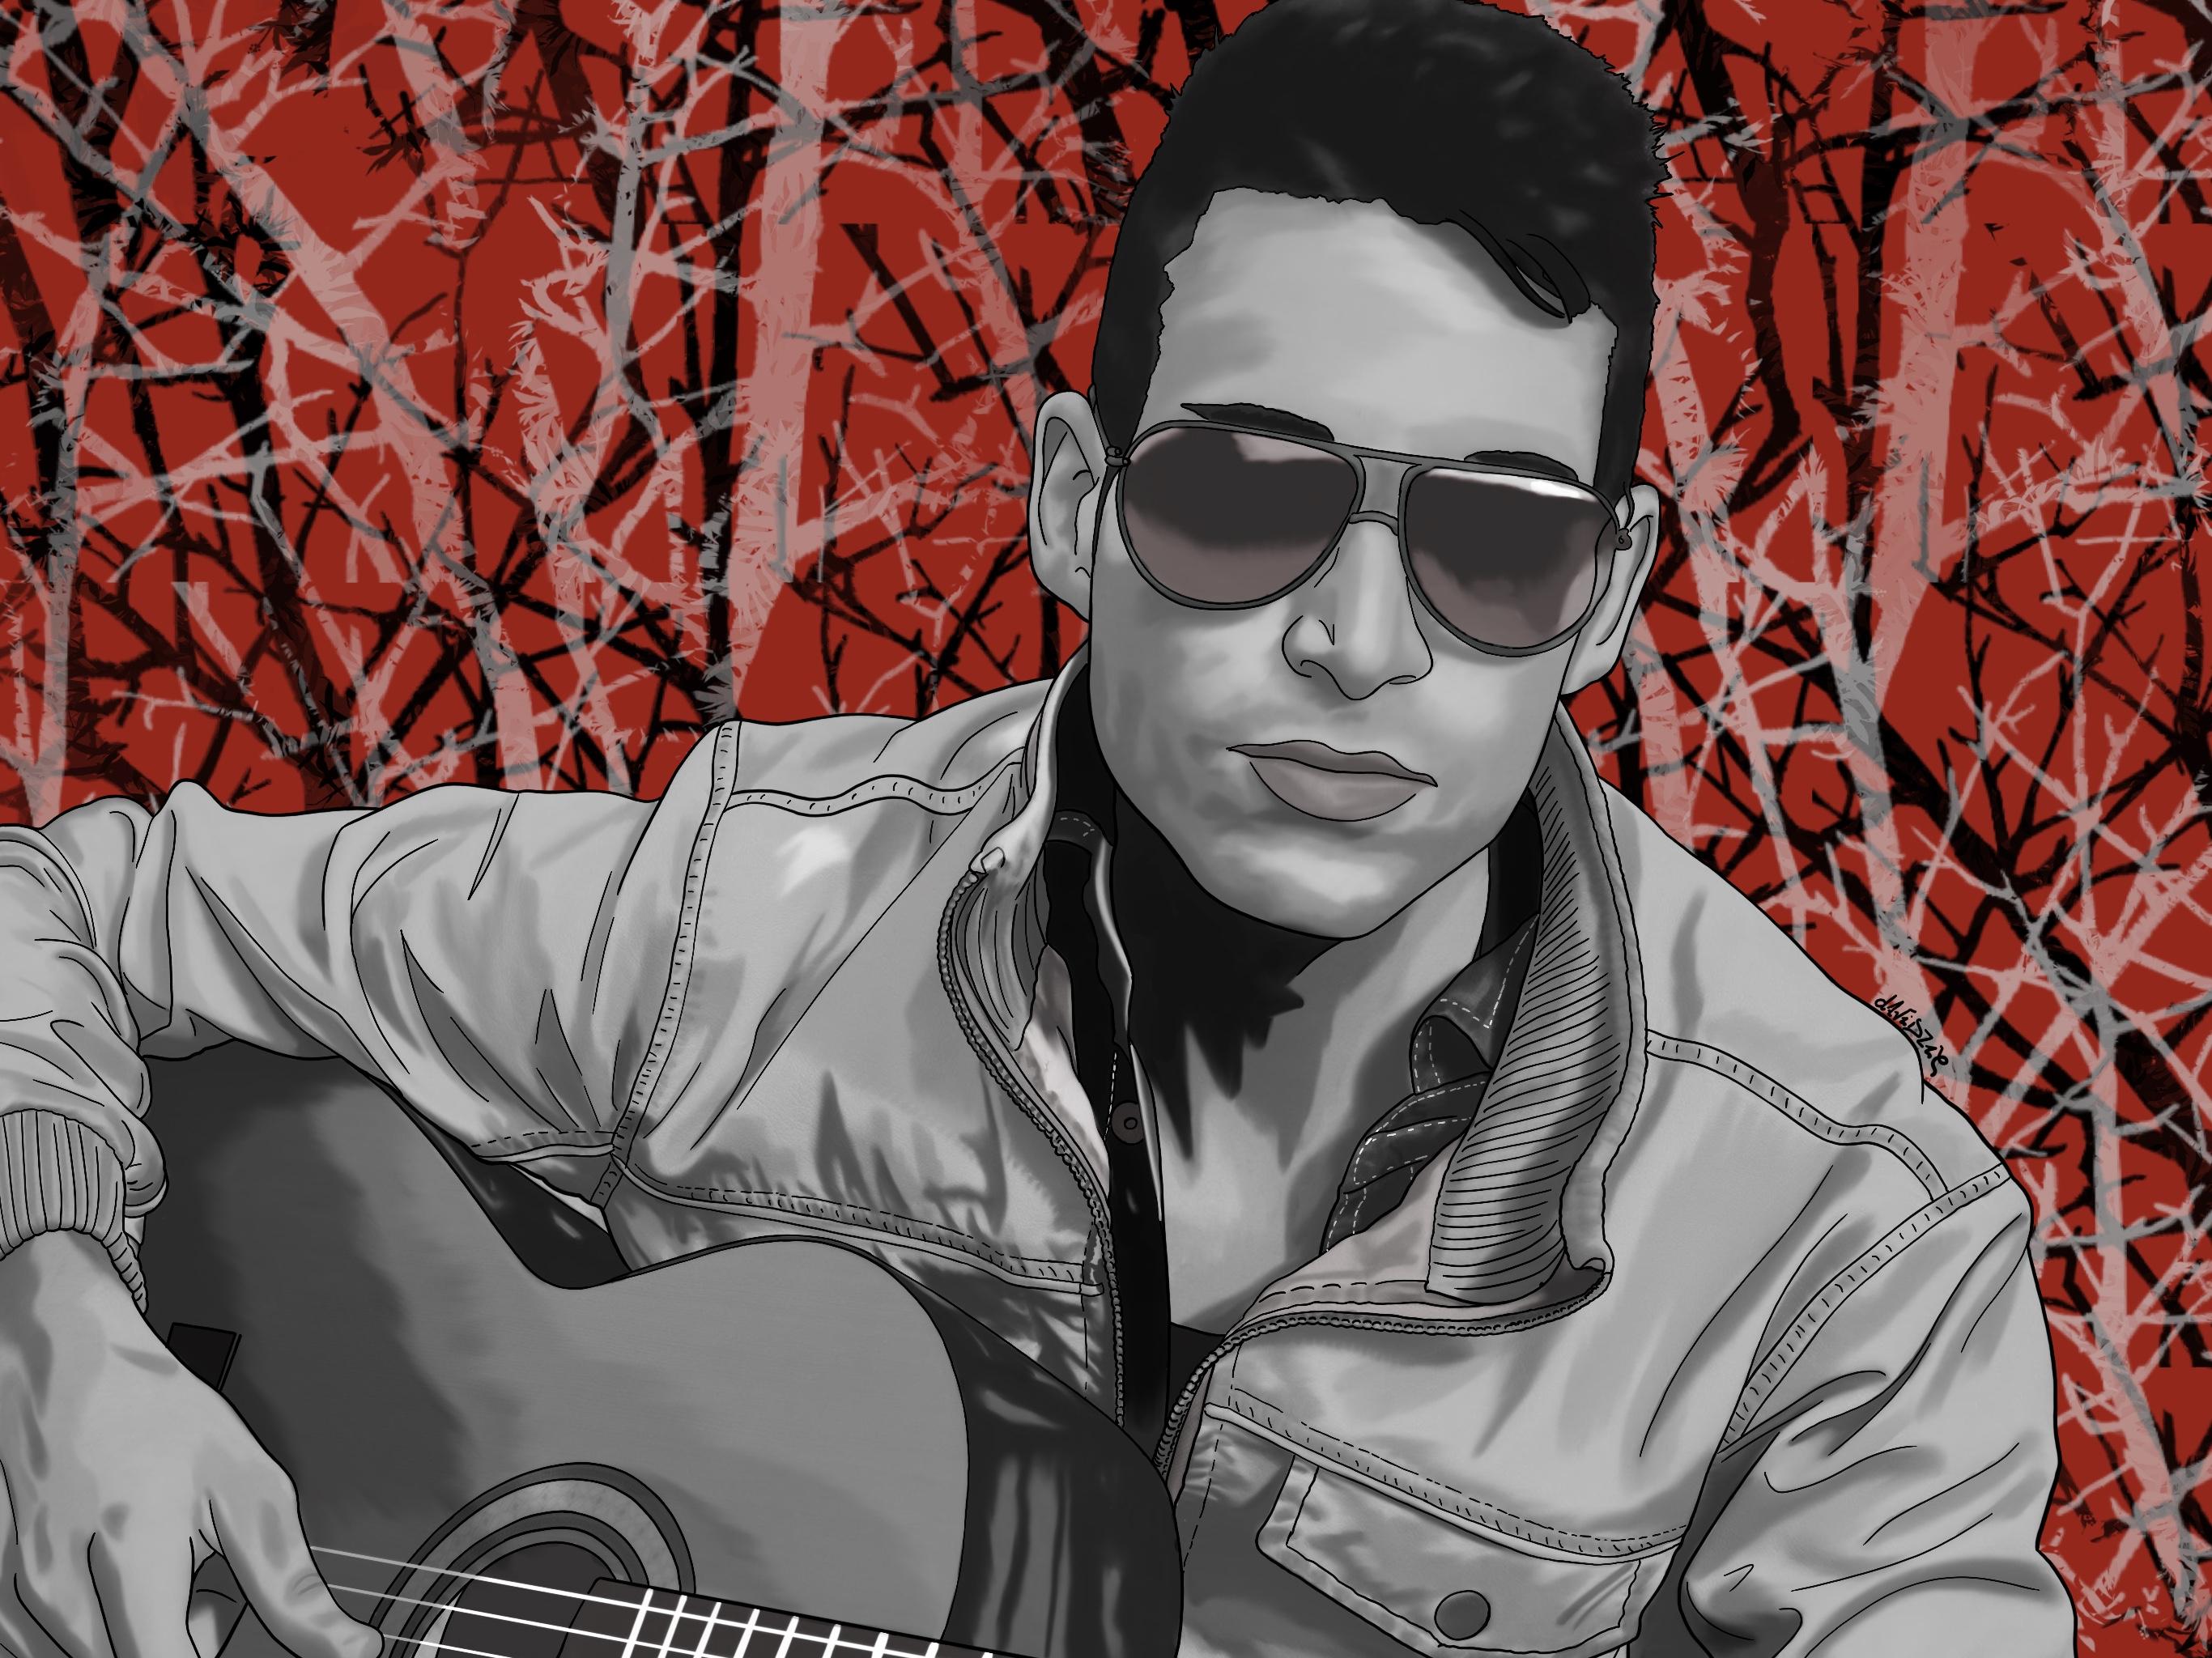 Retratos__David_Pallás_Gozalo_Guitar